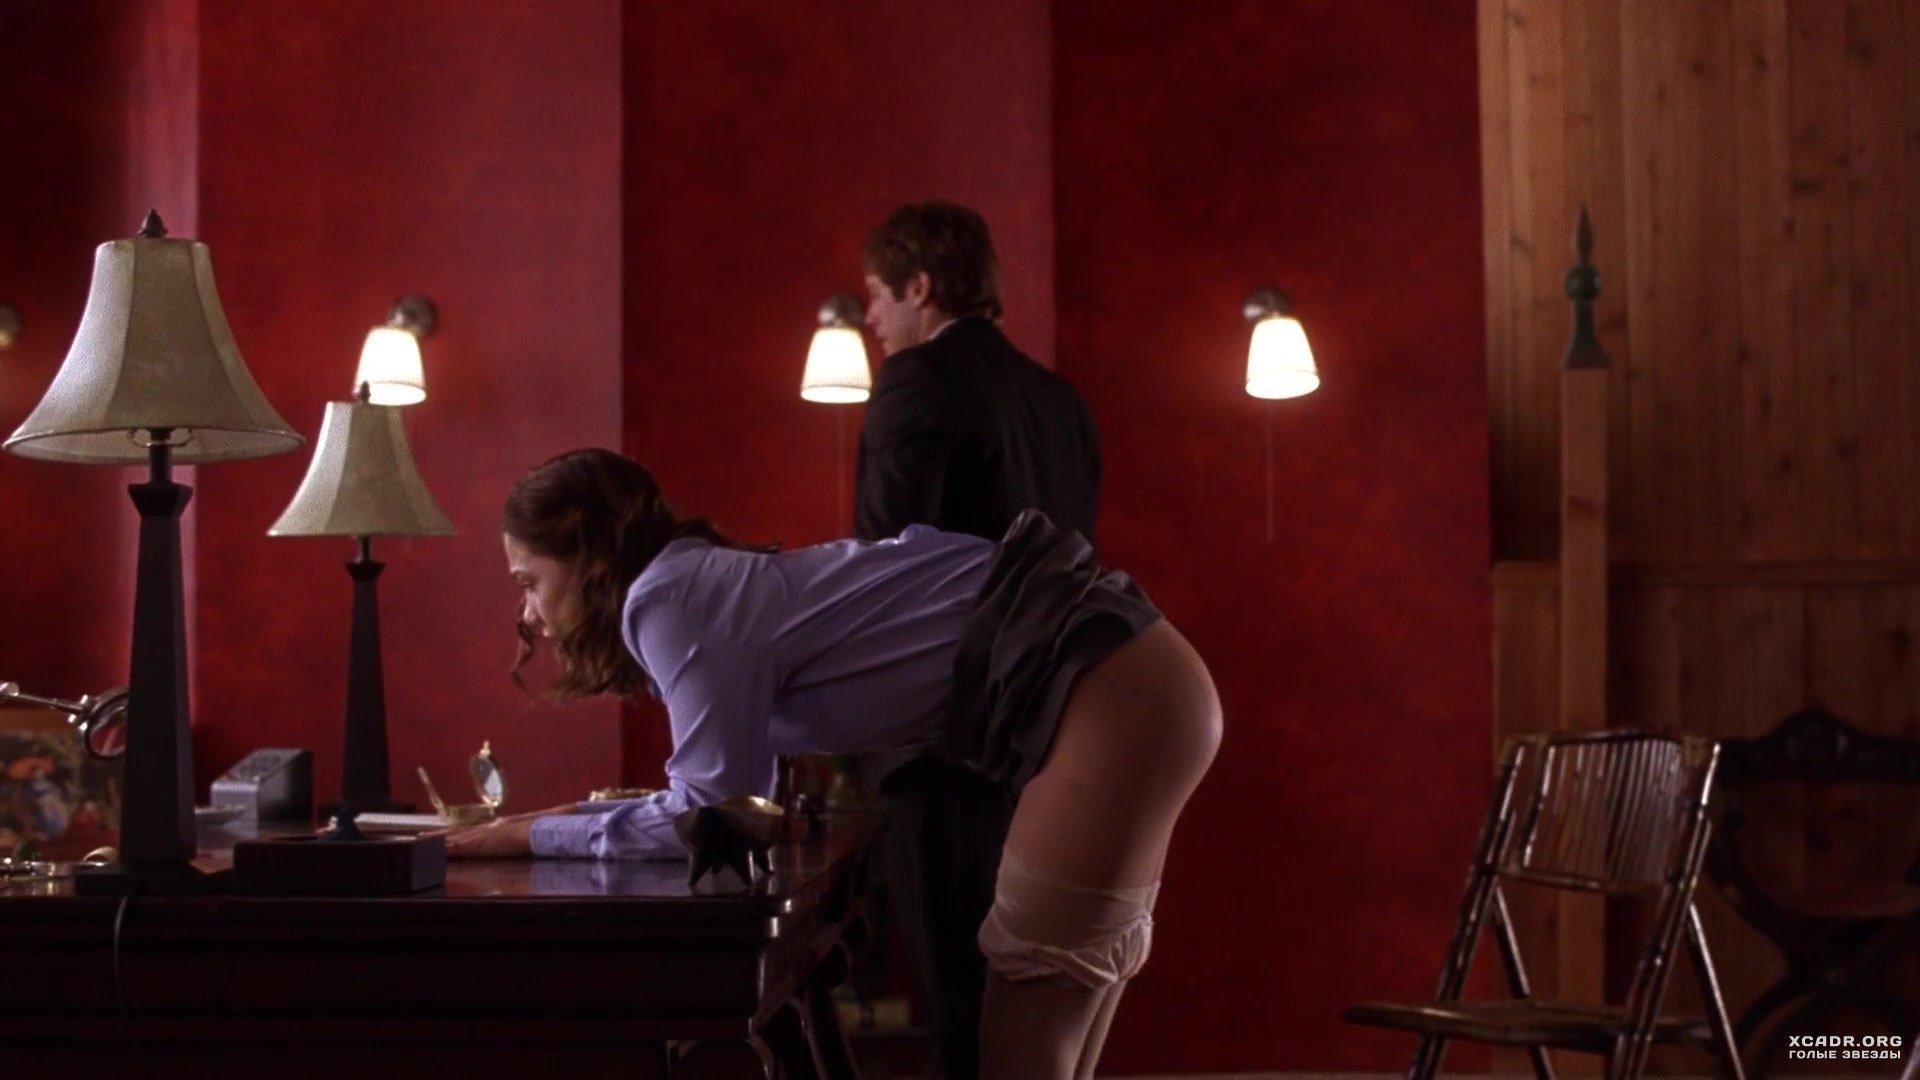 nauchnie-filmi-o-sekse